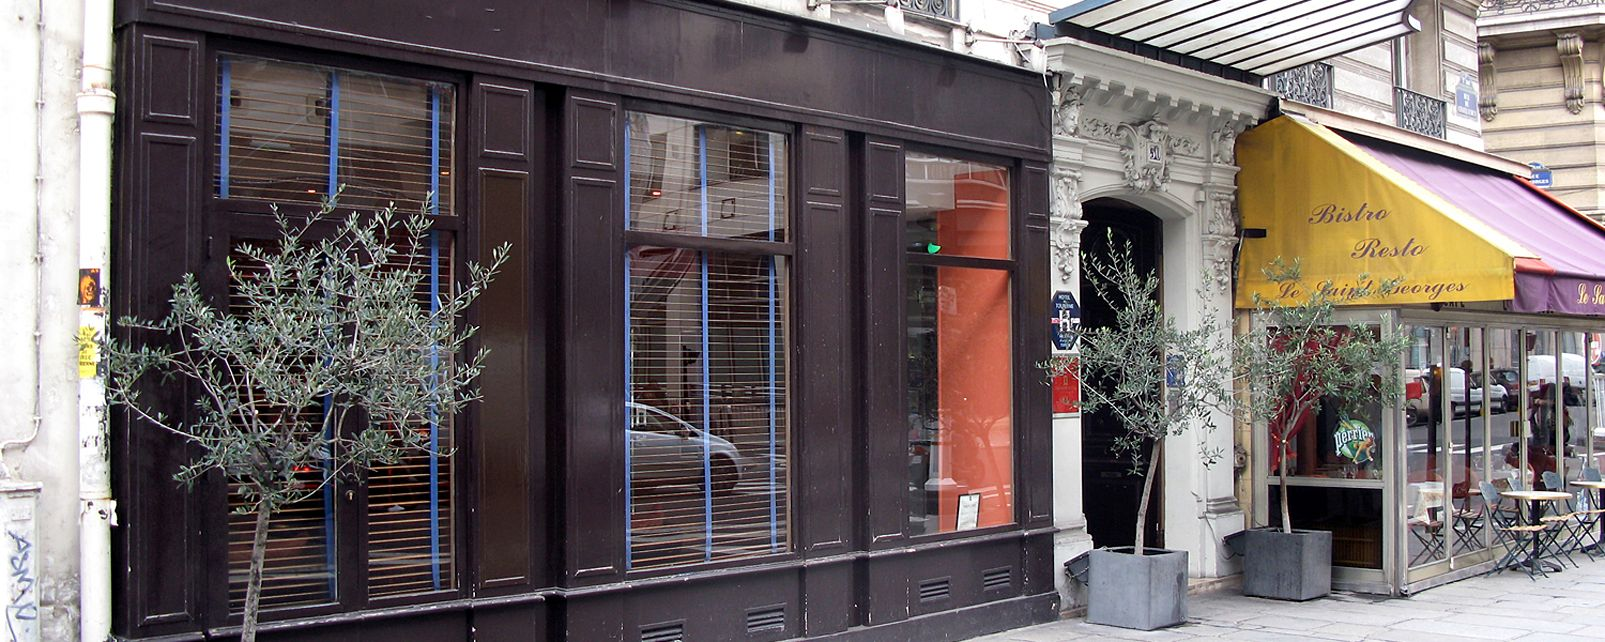 Hotel Chateaudun Hotel Paris